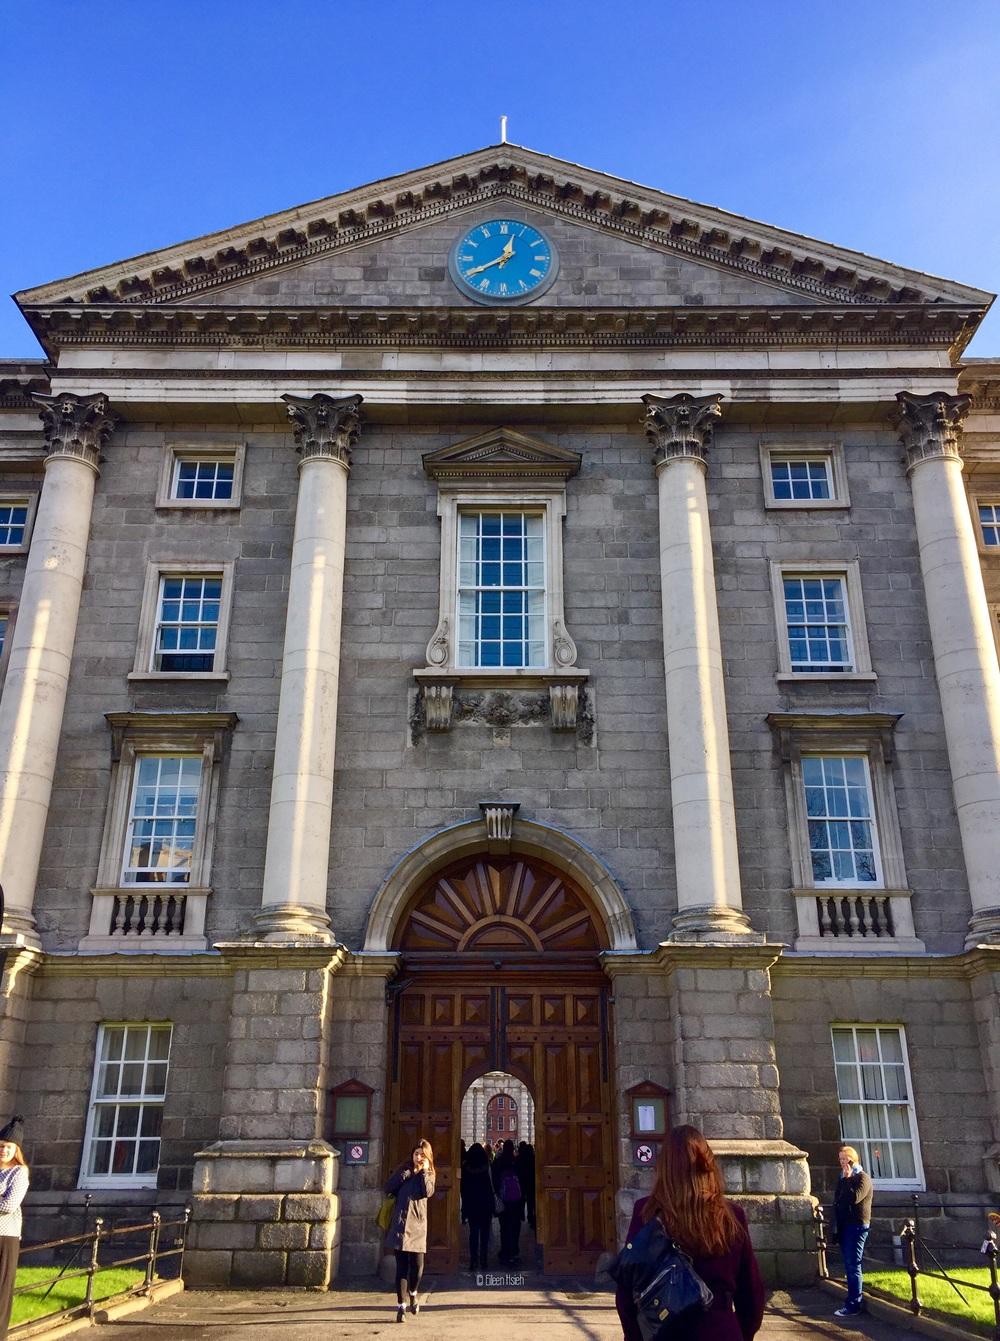 The main entrance of Trinity College Dublin.